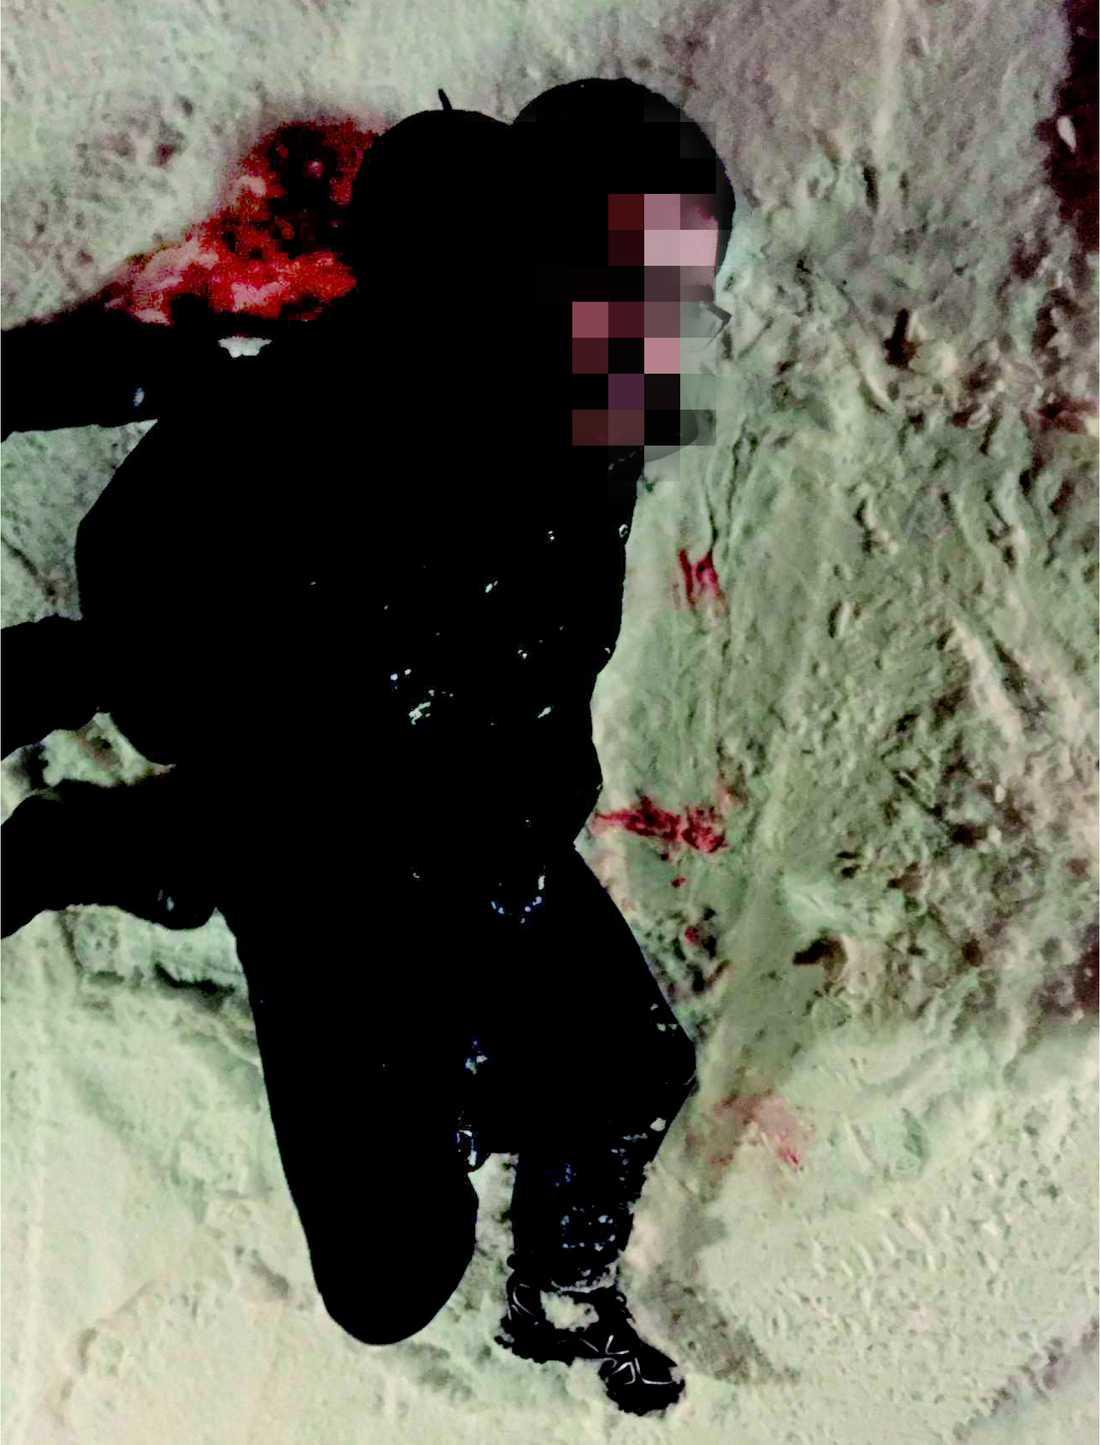 Mördaren efter polisens gripande.